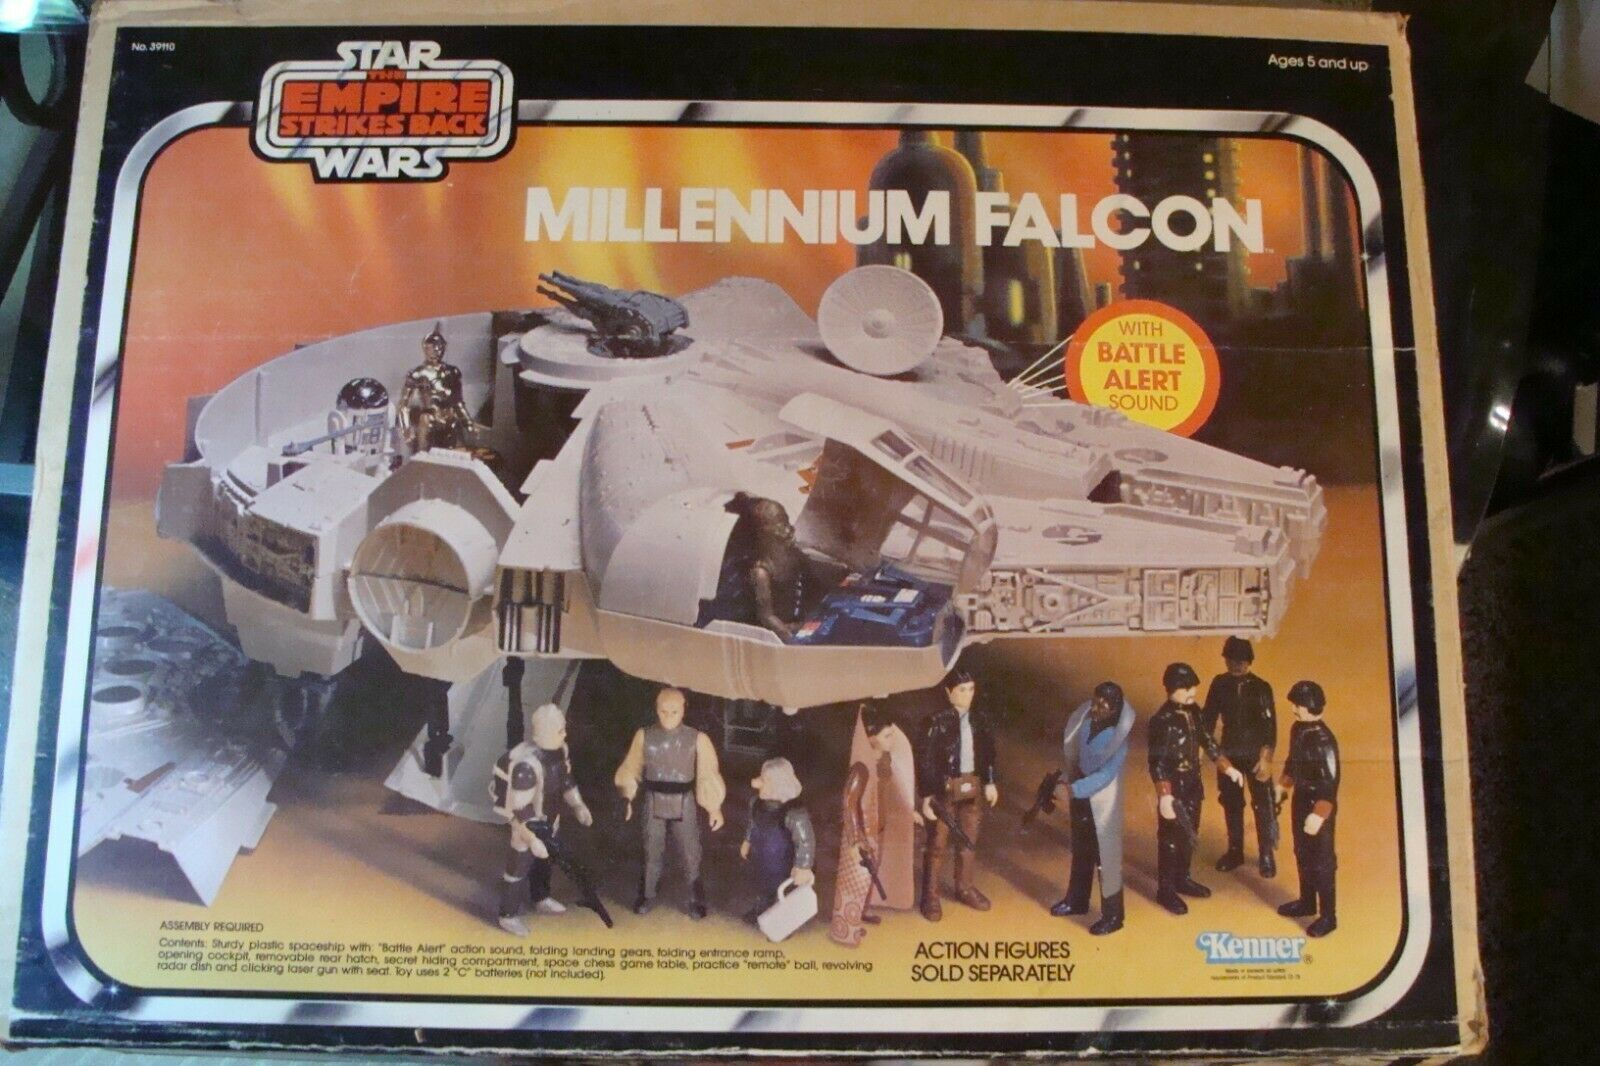 Star Wars 1980 MILLENNIUM FALCON boxed Kenner Empire Strikes Back vintage ship